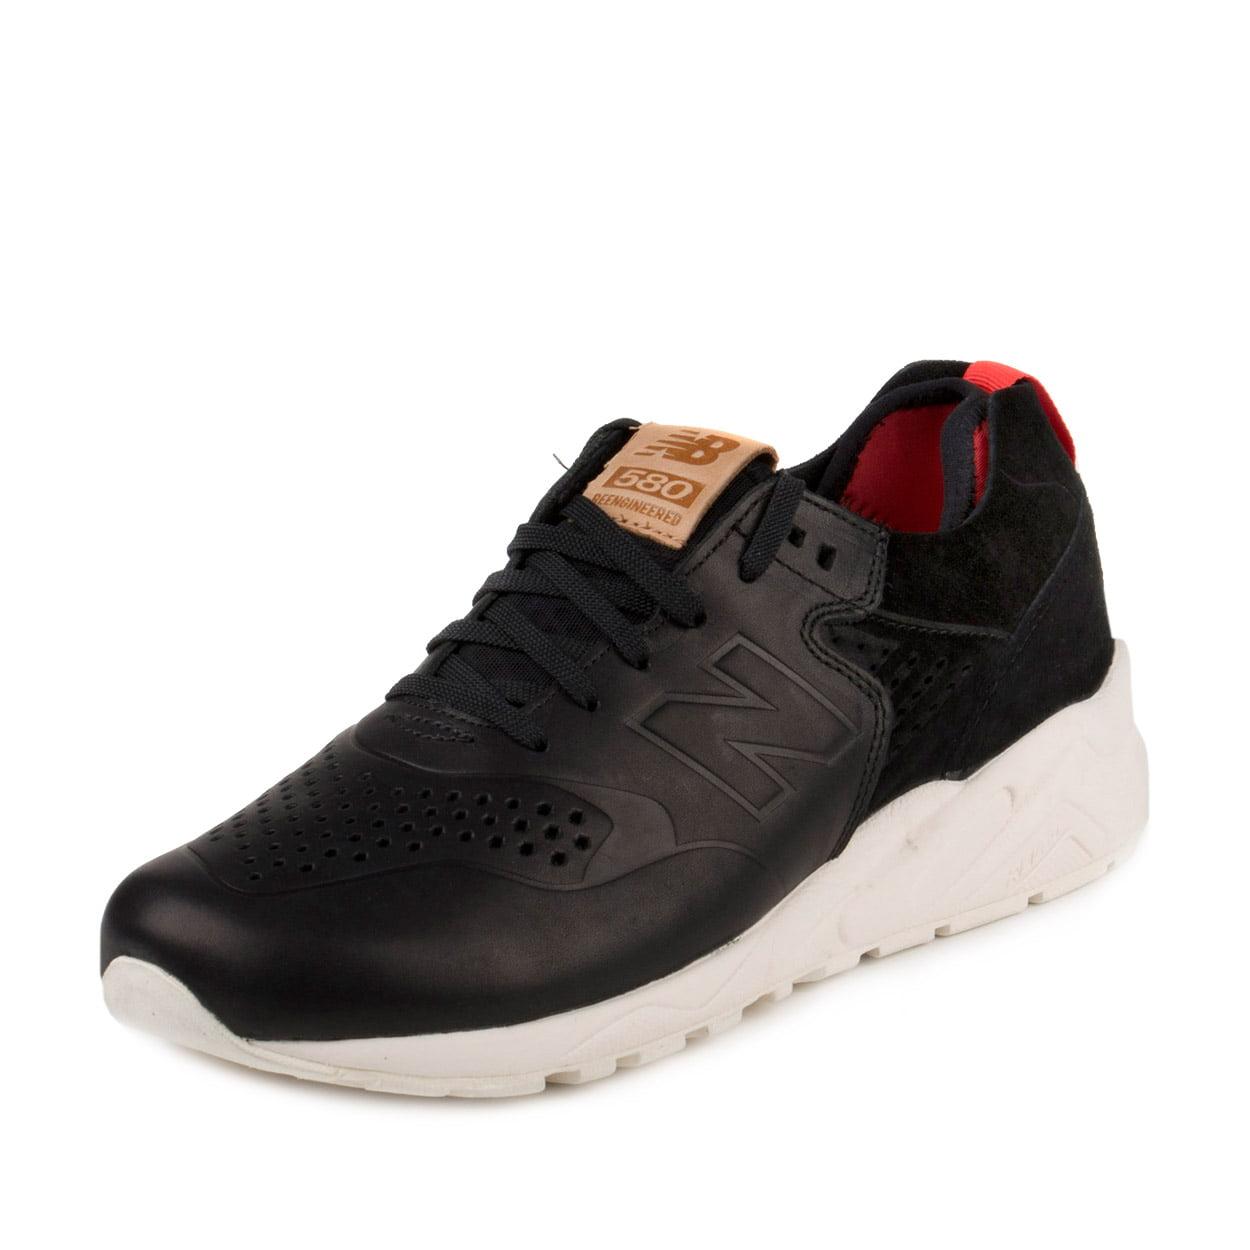 New Balance MRT580DK: 580 BLACK/White/Red Premium Comfort Casual Leather Sneaker